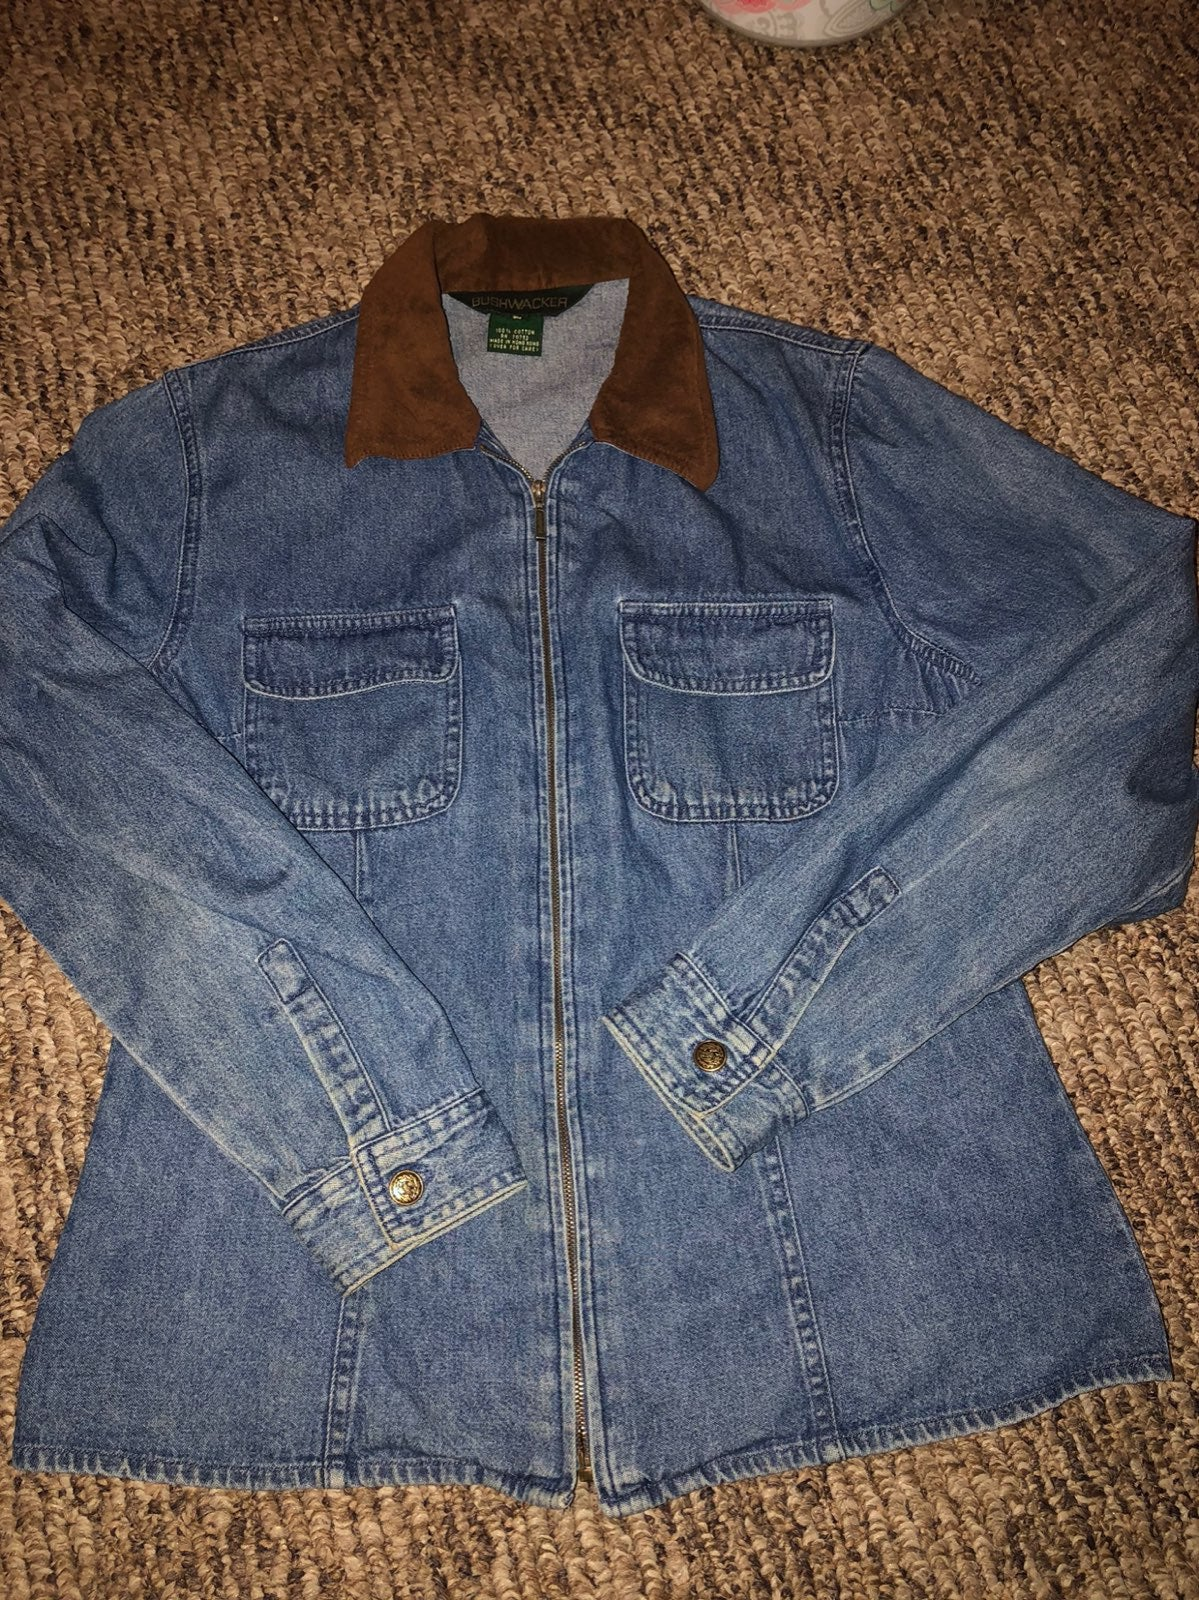 light weight blue jean pullover